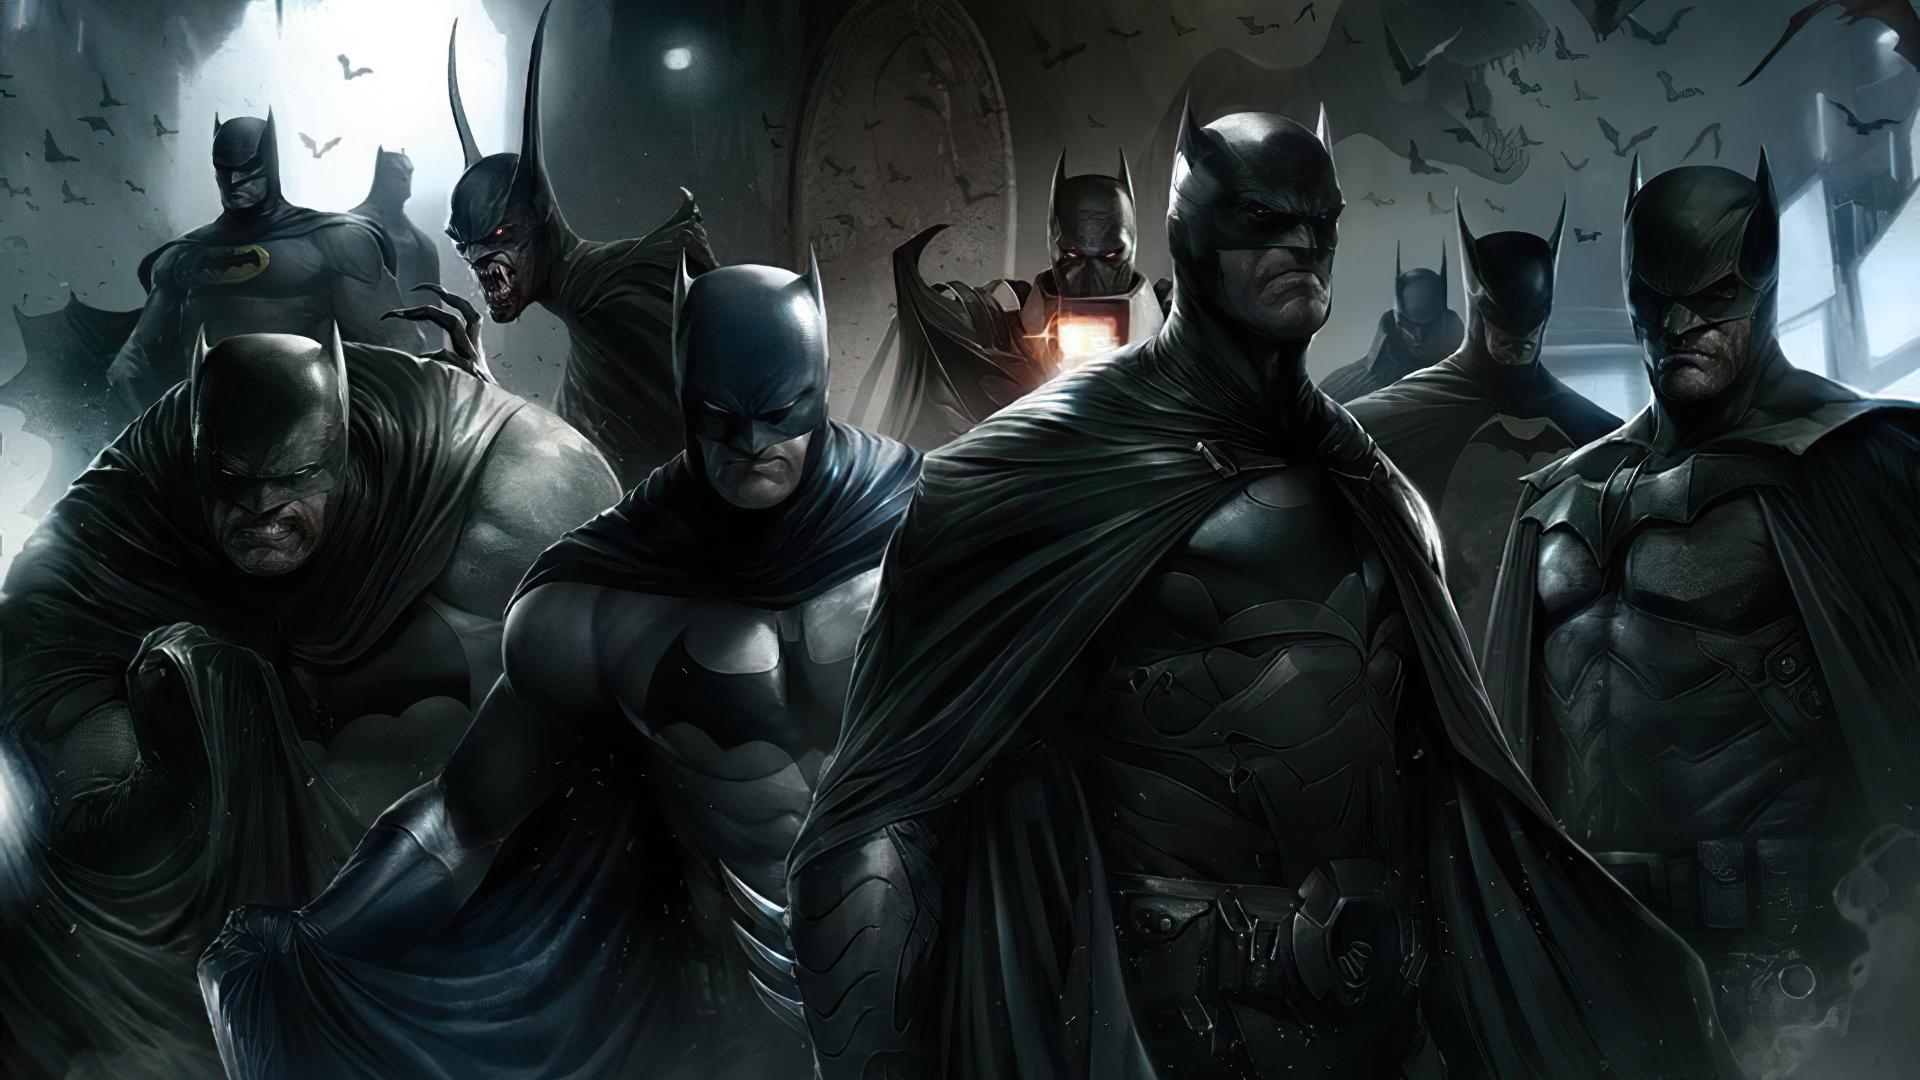 1920x1080 Batman Versions Laptop Full HD 1080P HD 4k ...